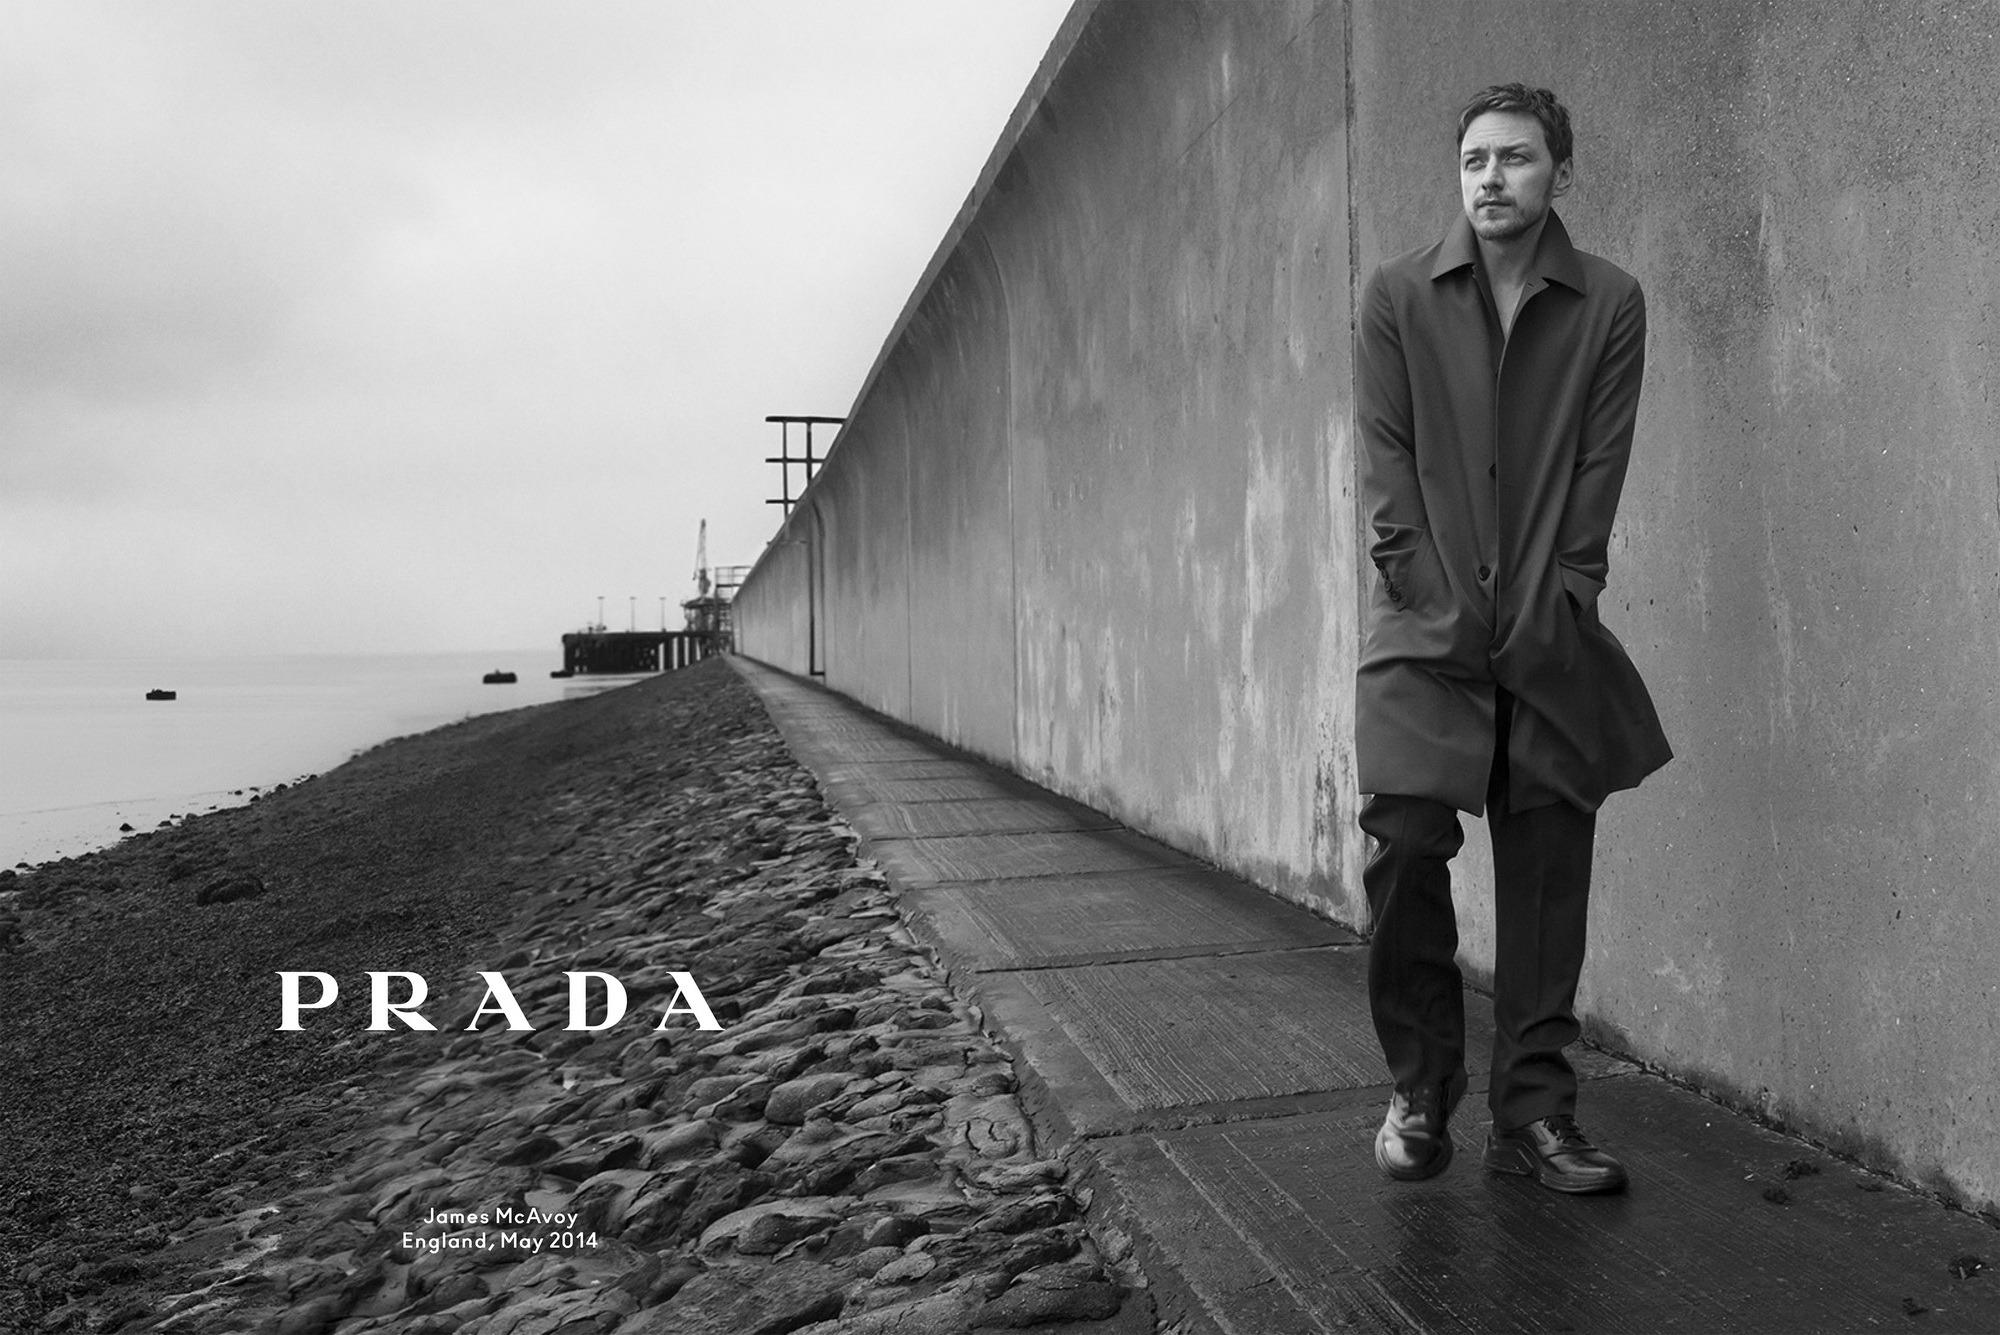 prada1 - Prada Menswear Fall/Winter 2014 Campaign